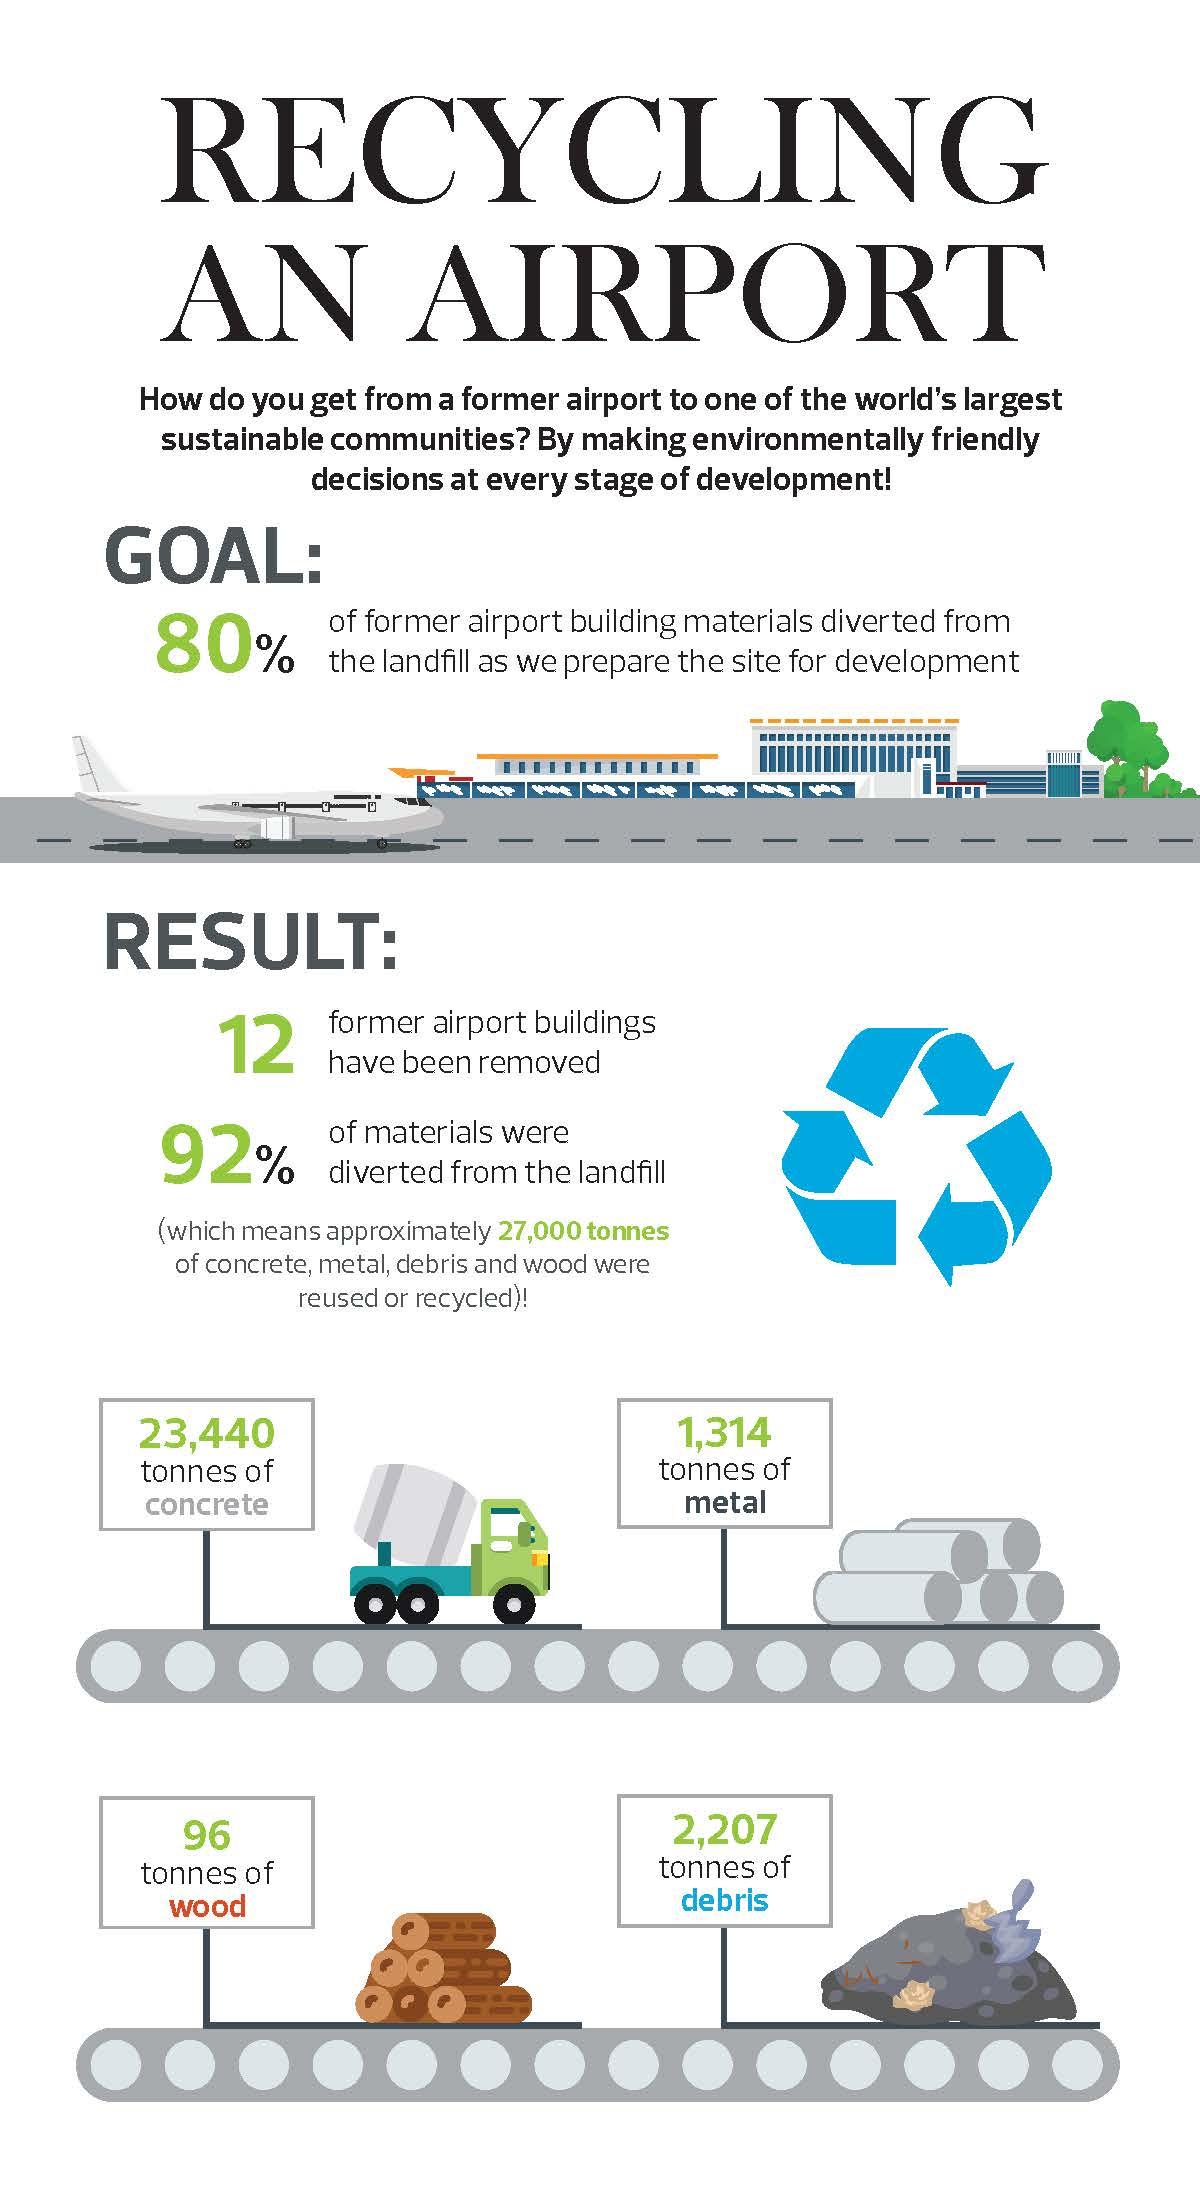 Blatchford_RecyclingAnAirport_Feb22_2017 (1)